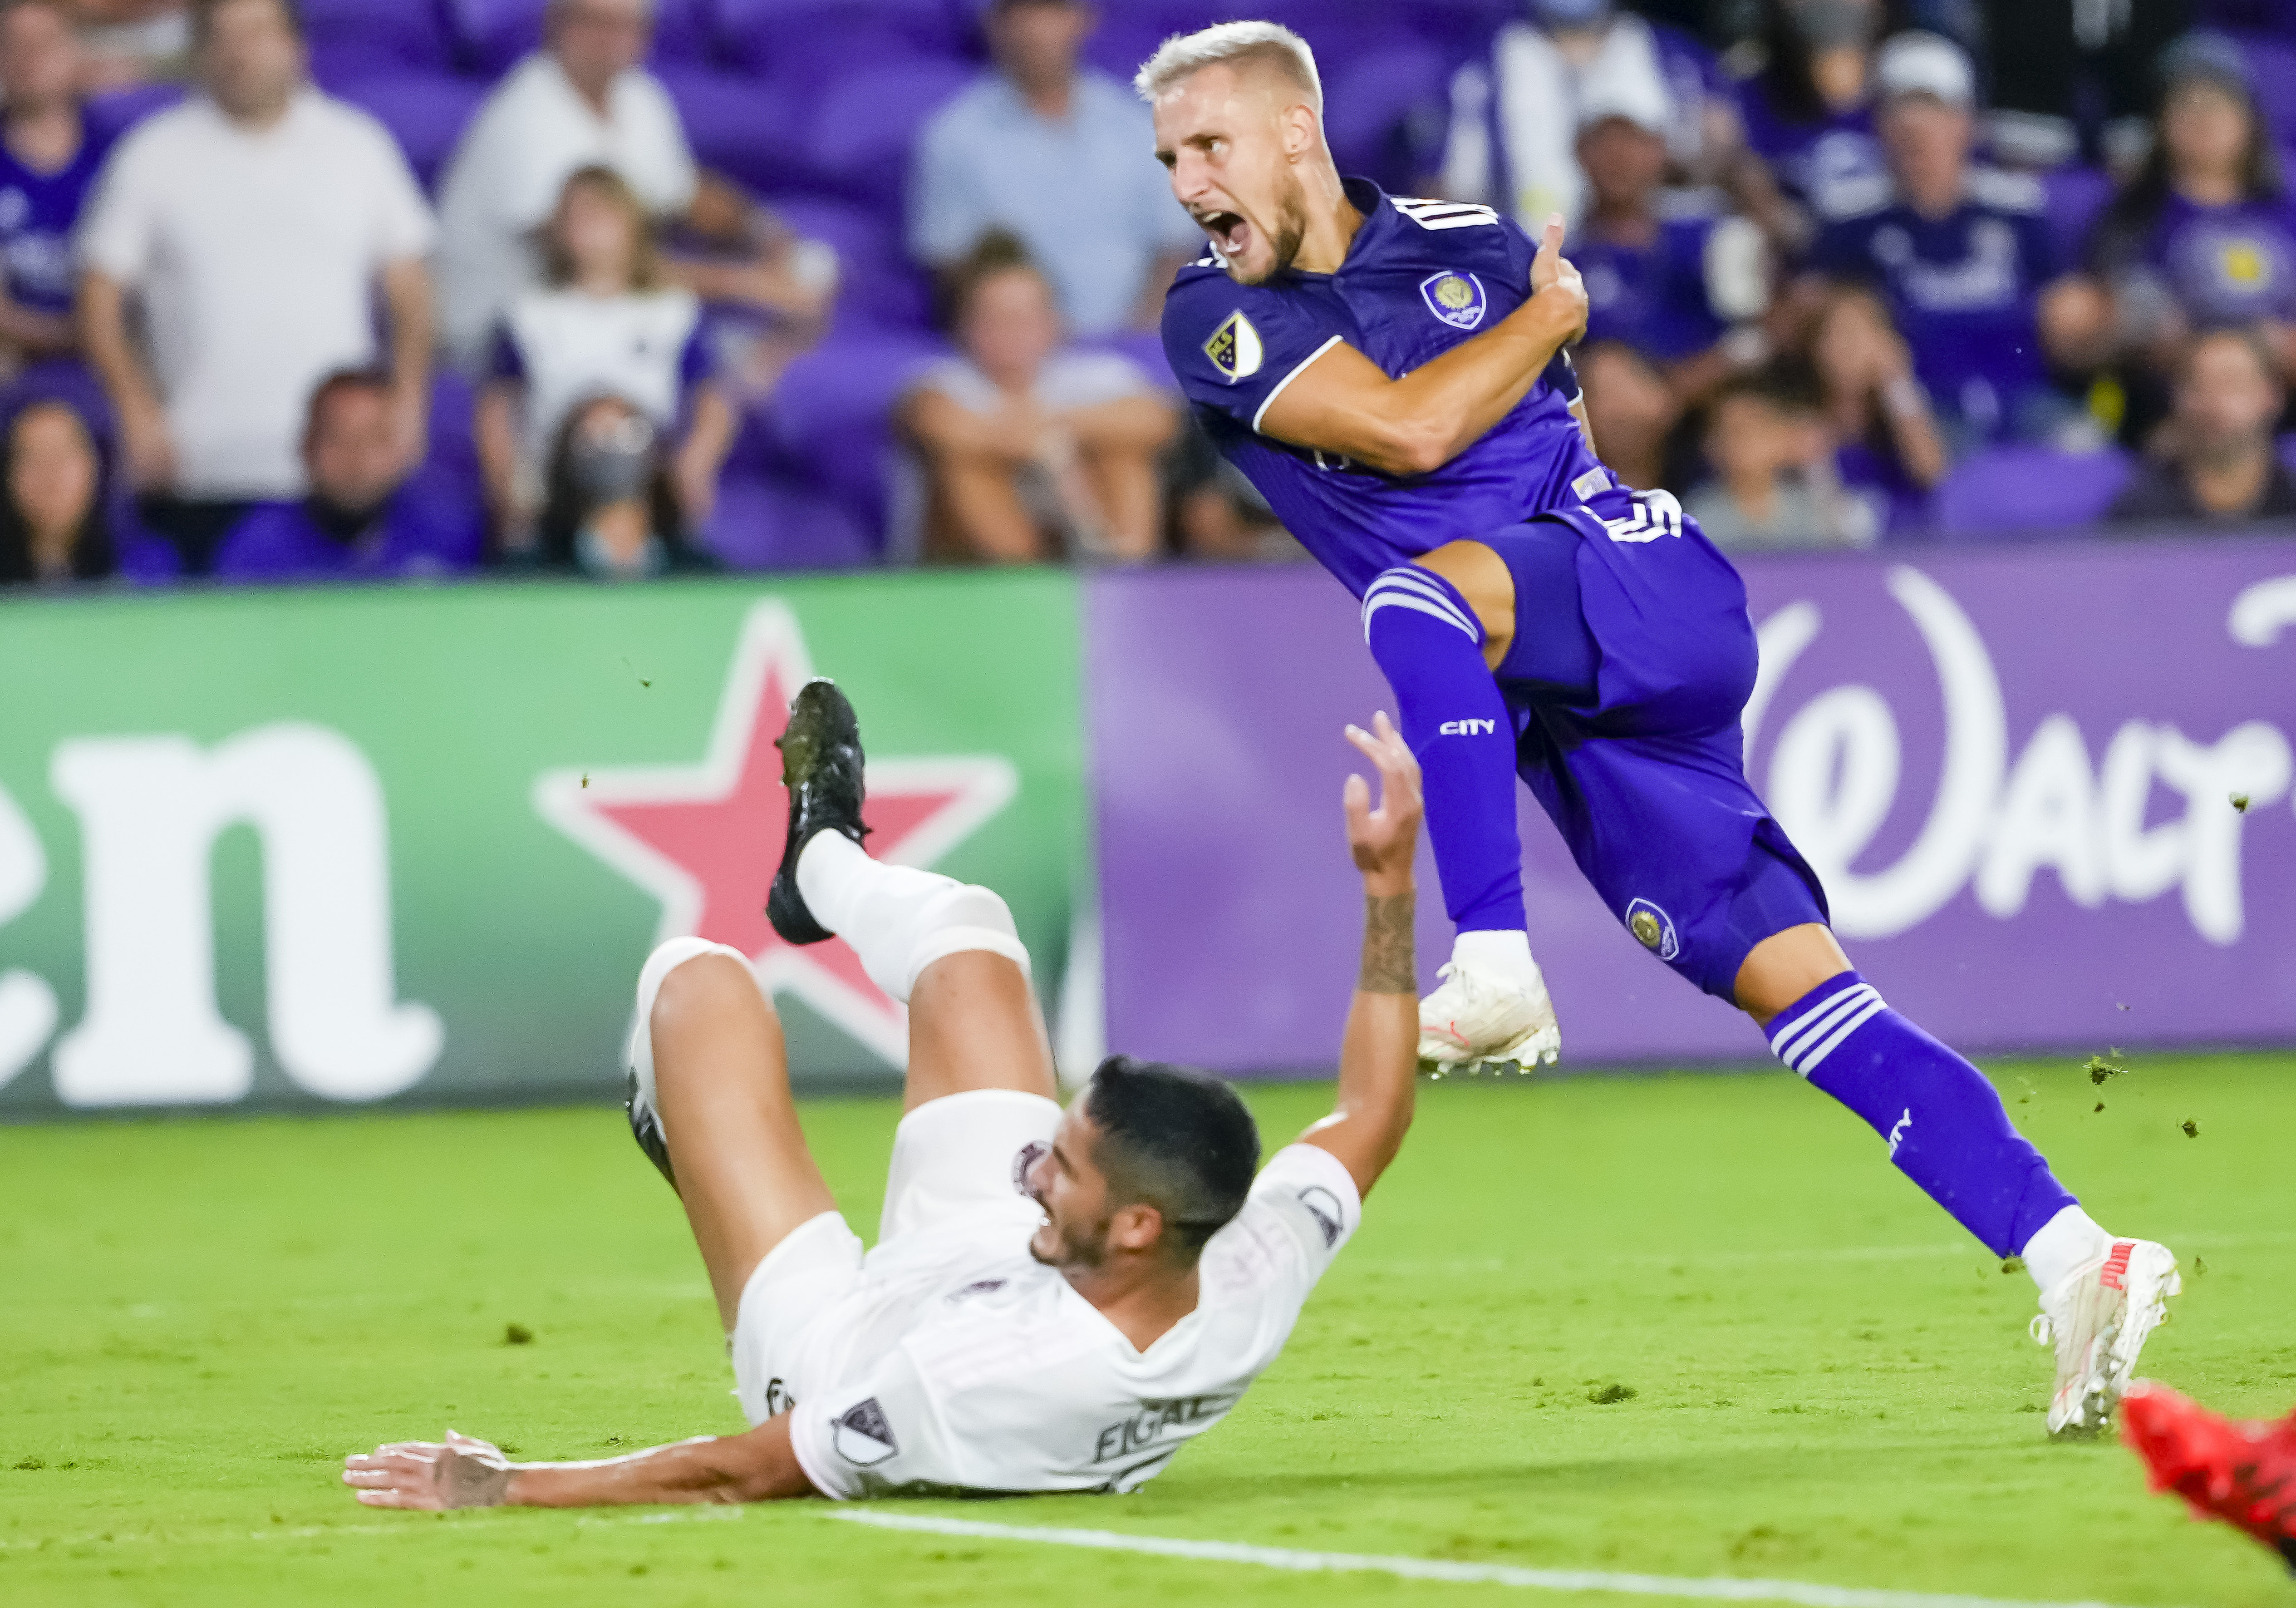 SOCCER: AUG 04 MLS - Inter Miami CF at Orlando City SC